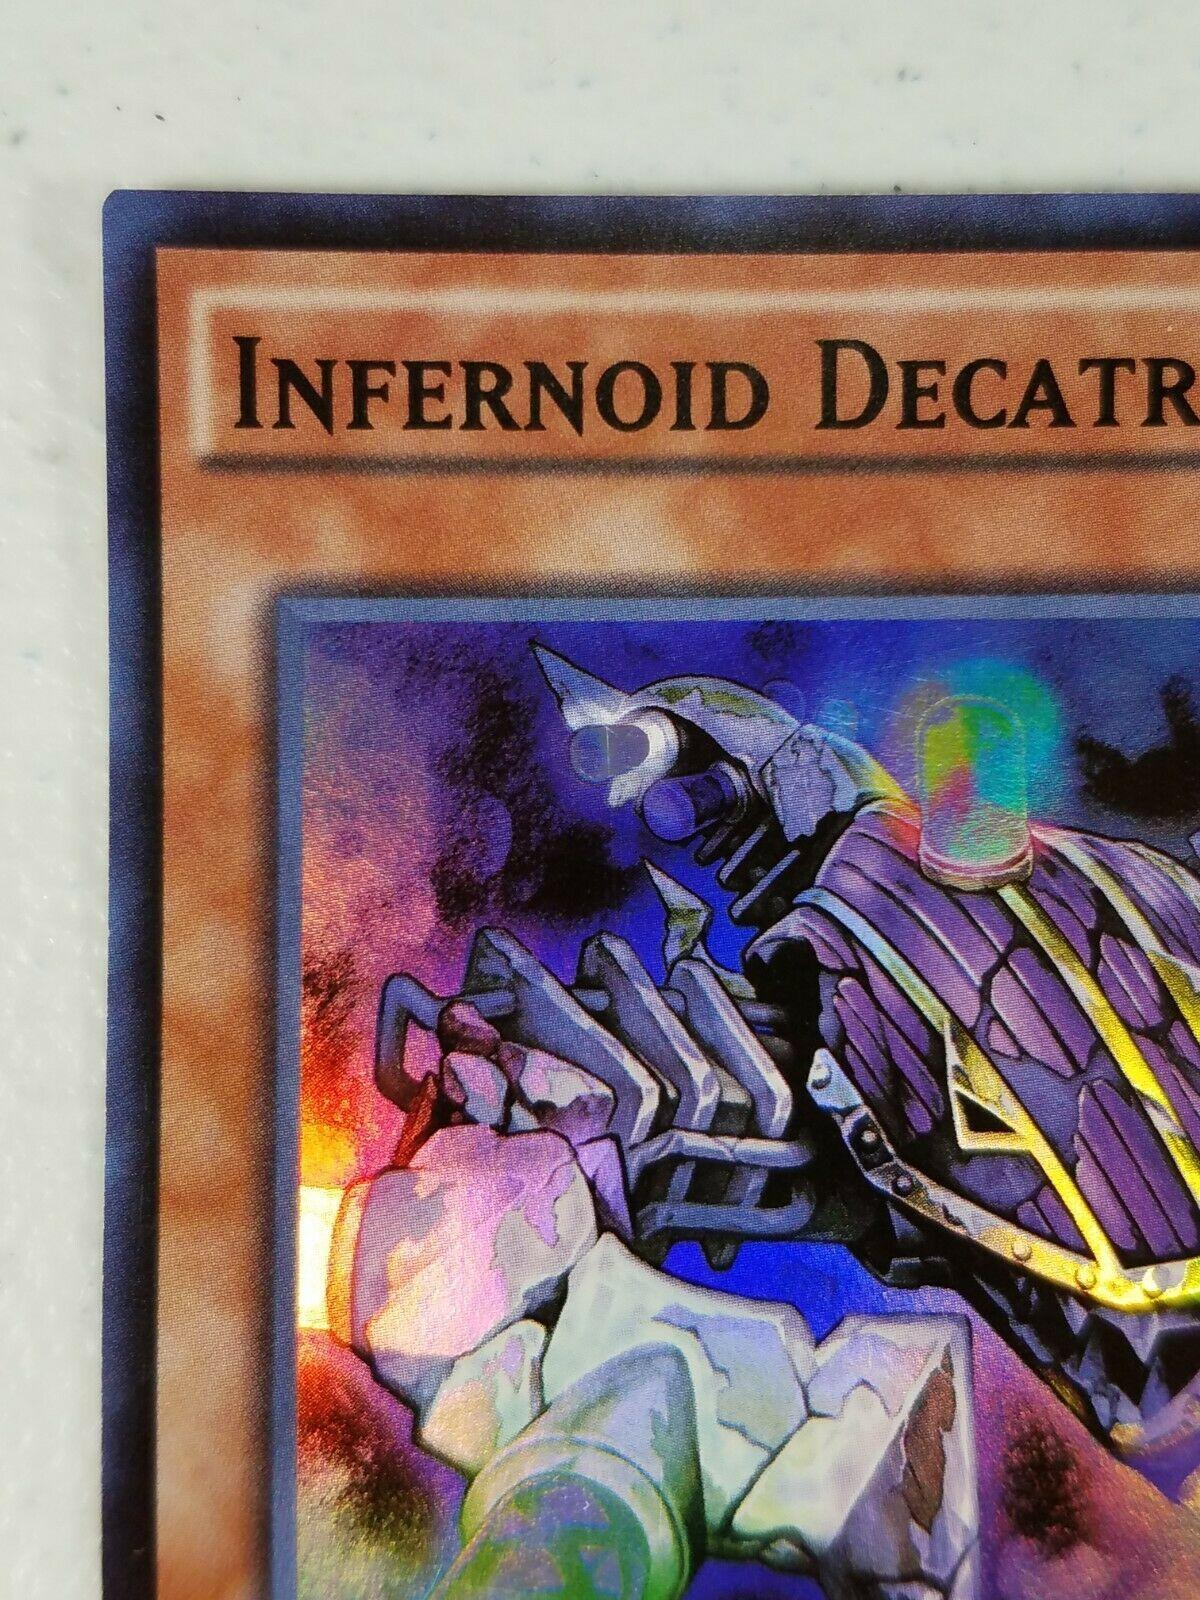 Yu-gi-oh! Trading Card - Infernoid Decatron - CORE-EN039 - Super Rare - 1st Ed.